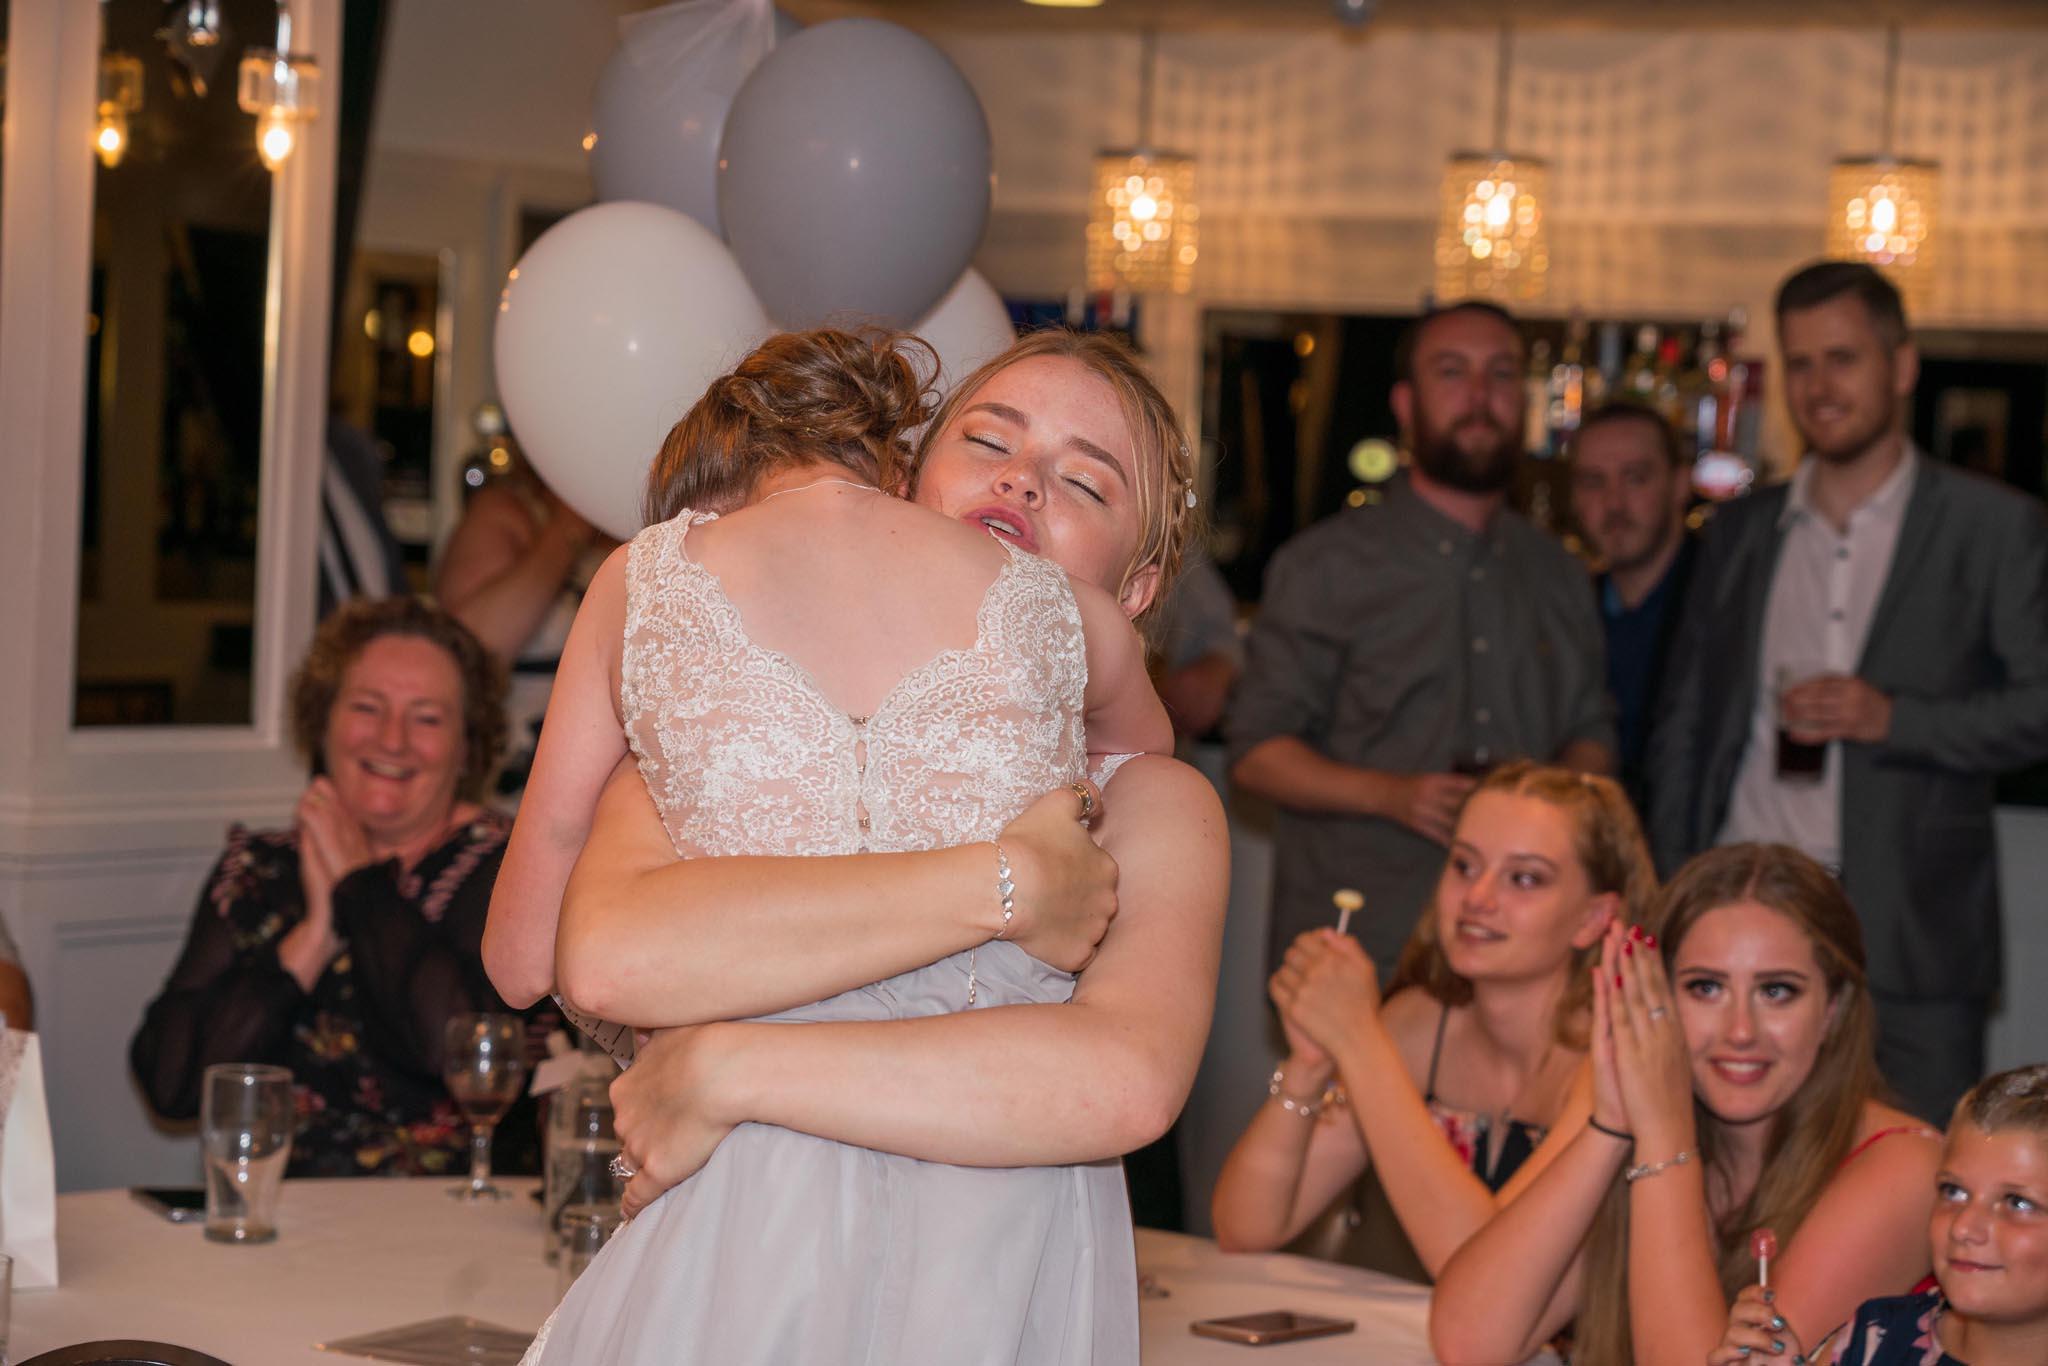 922-Speeches-Luke-Yasmin-The-Rayleigh-Club-Wedding-Photography.jpg